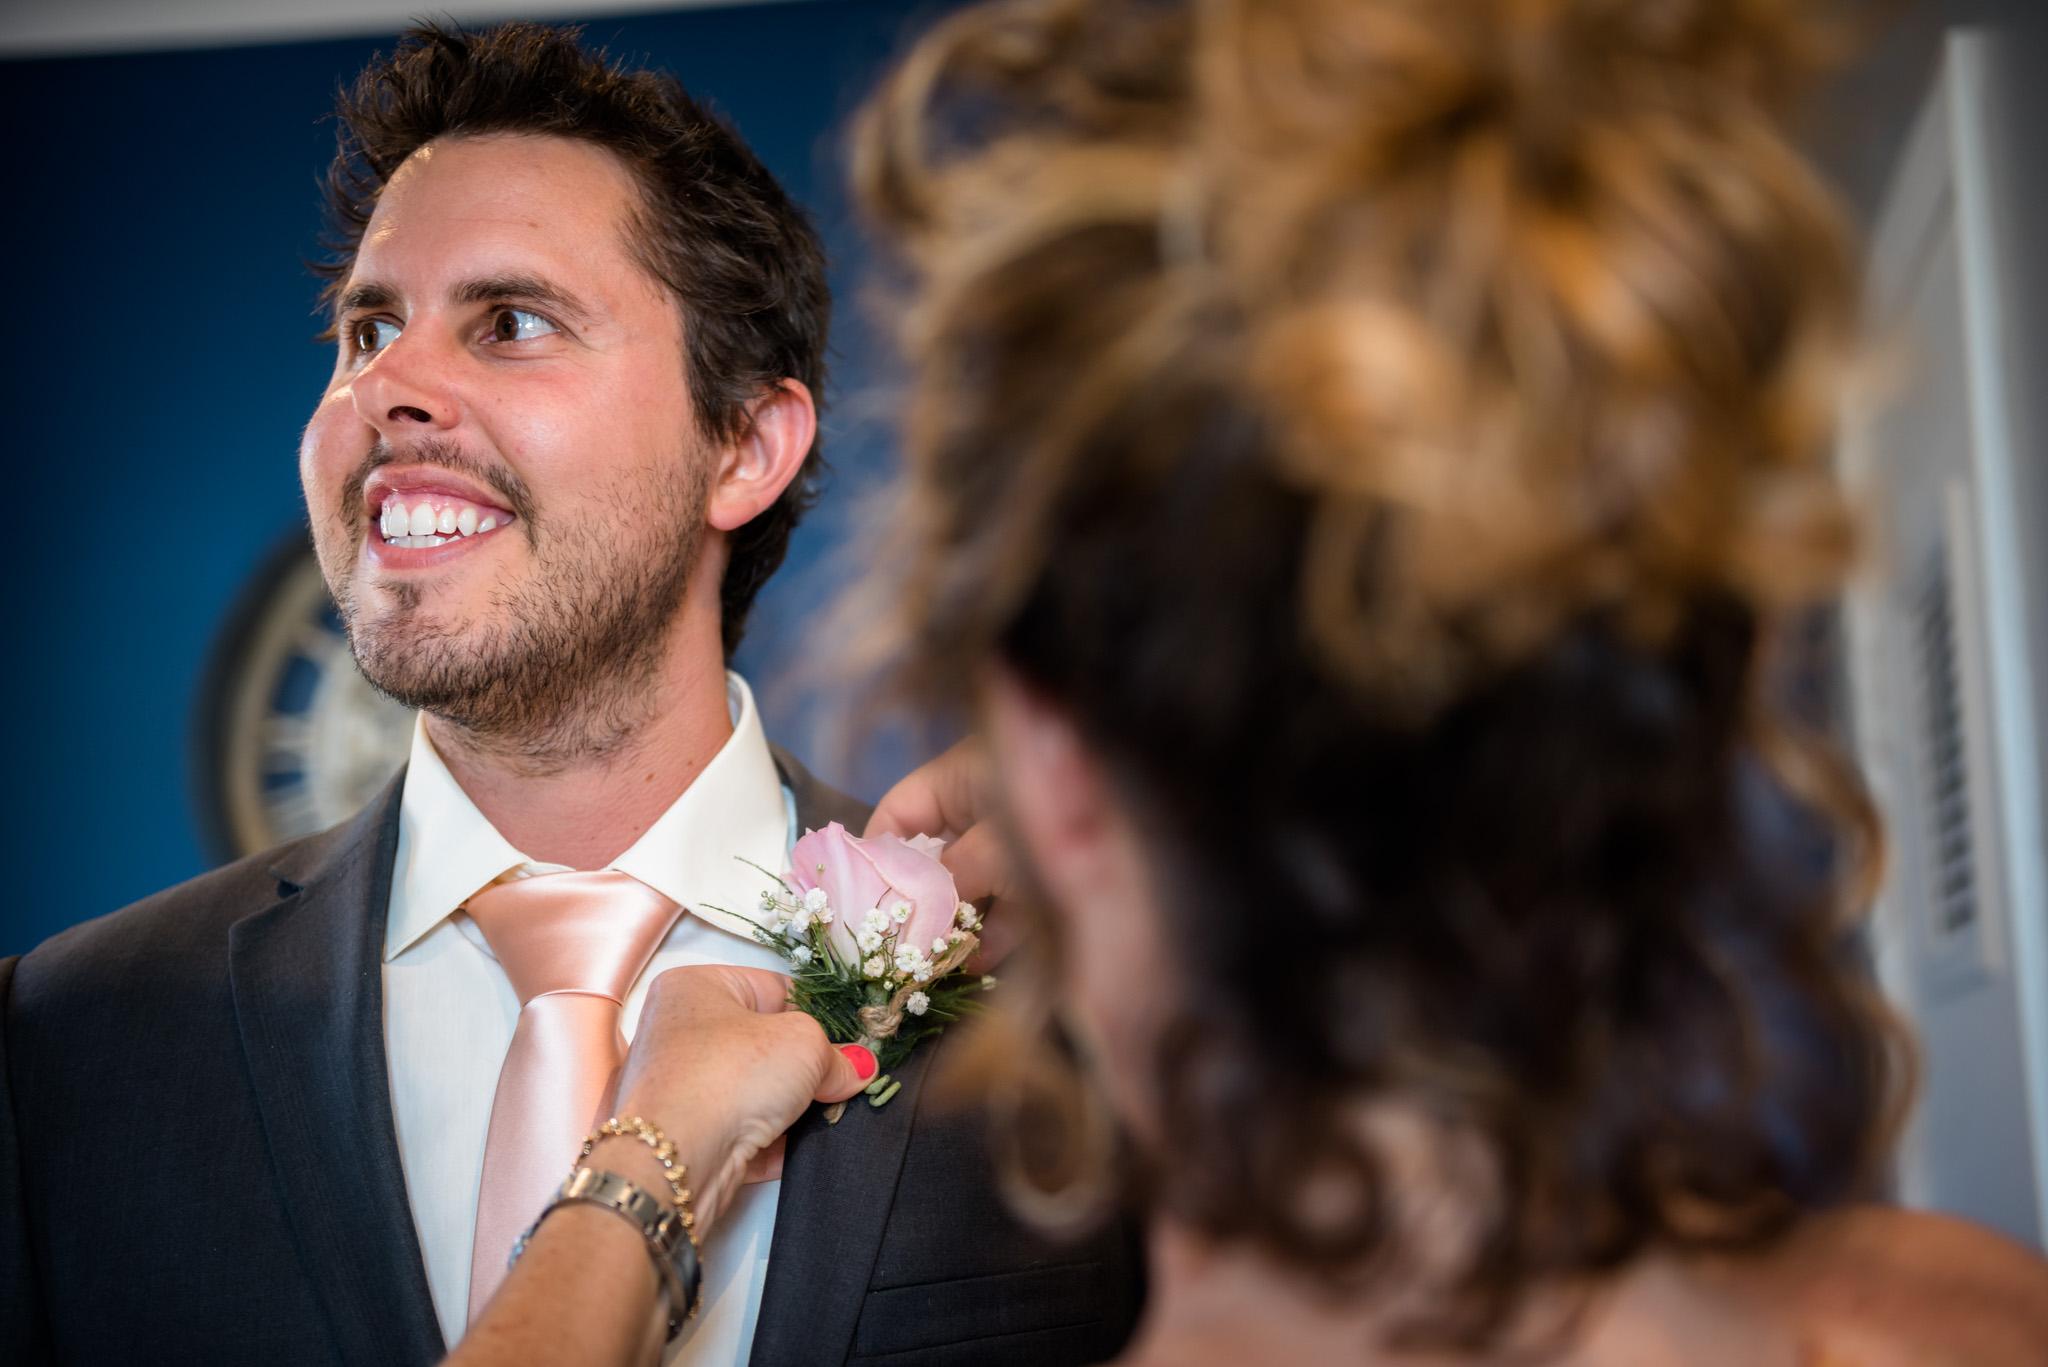 Avensole-Winery-Temecula-Wedding-Josh-and-Olivia-3318.JPG